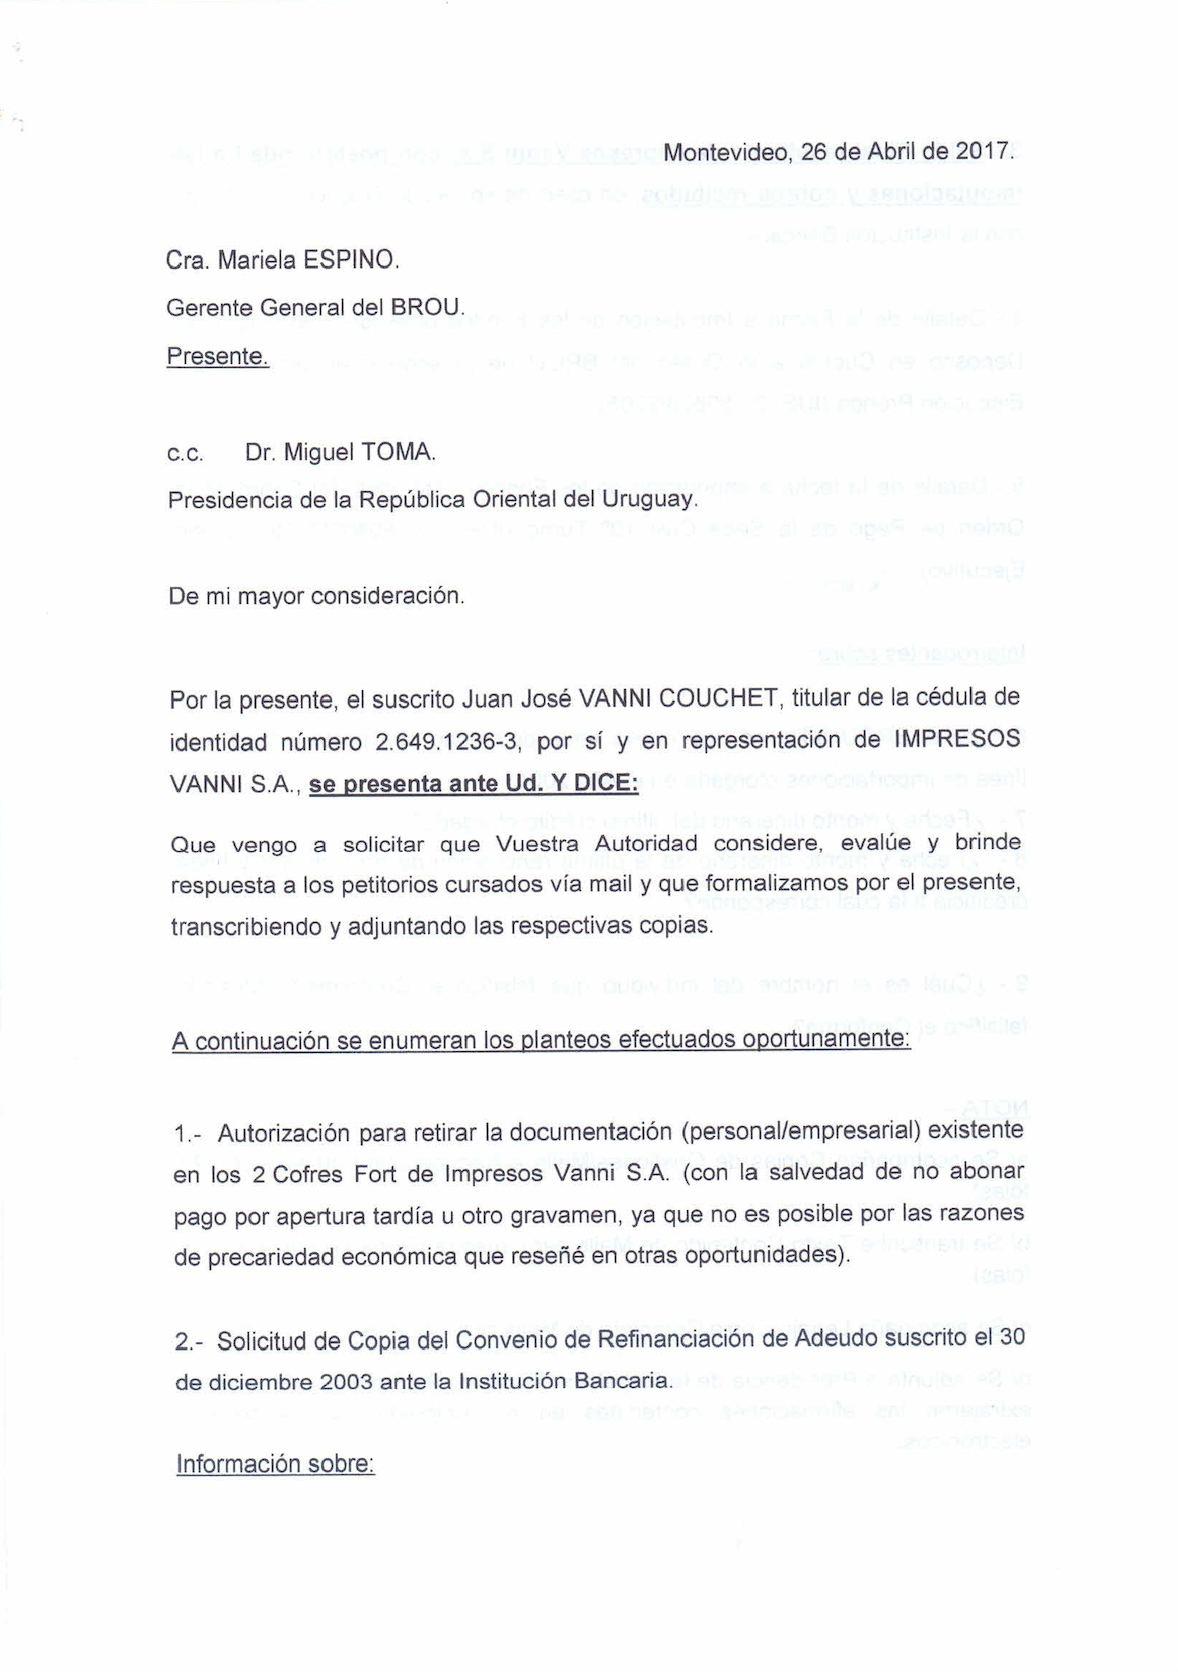 Calaméo - TRANSCRIPCION TEXTO CONTENIDO DE MAILS DE: Sr. JUAN JOSE ...